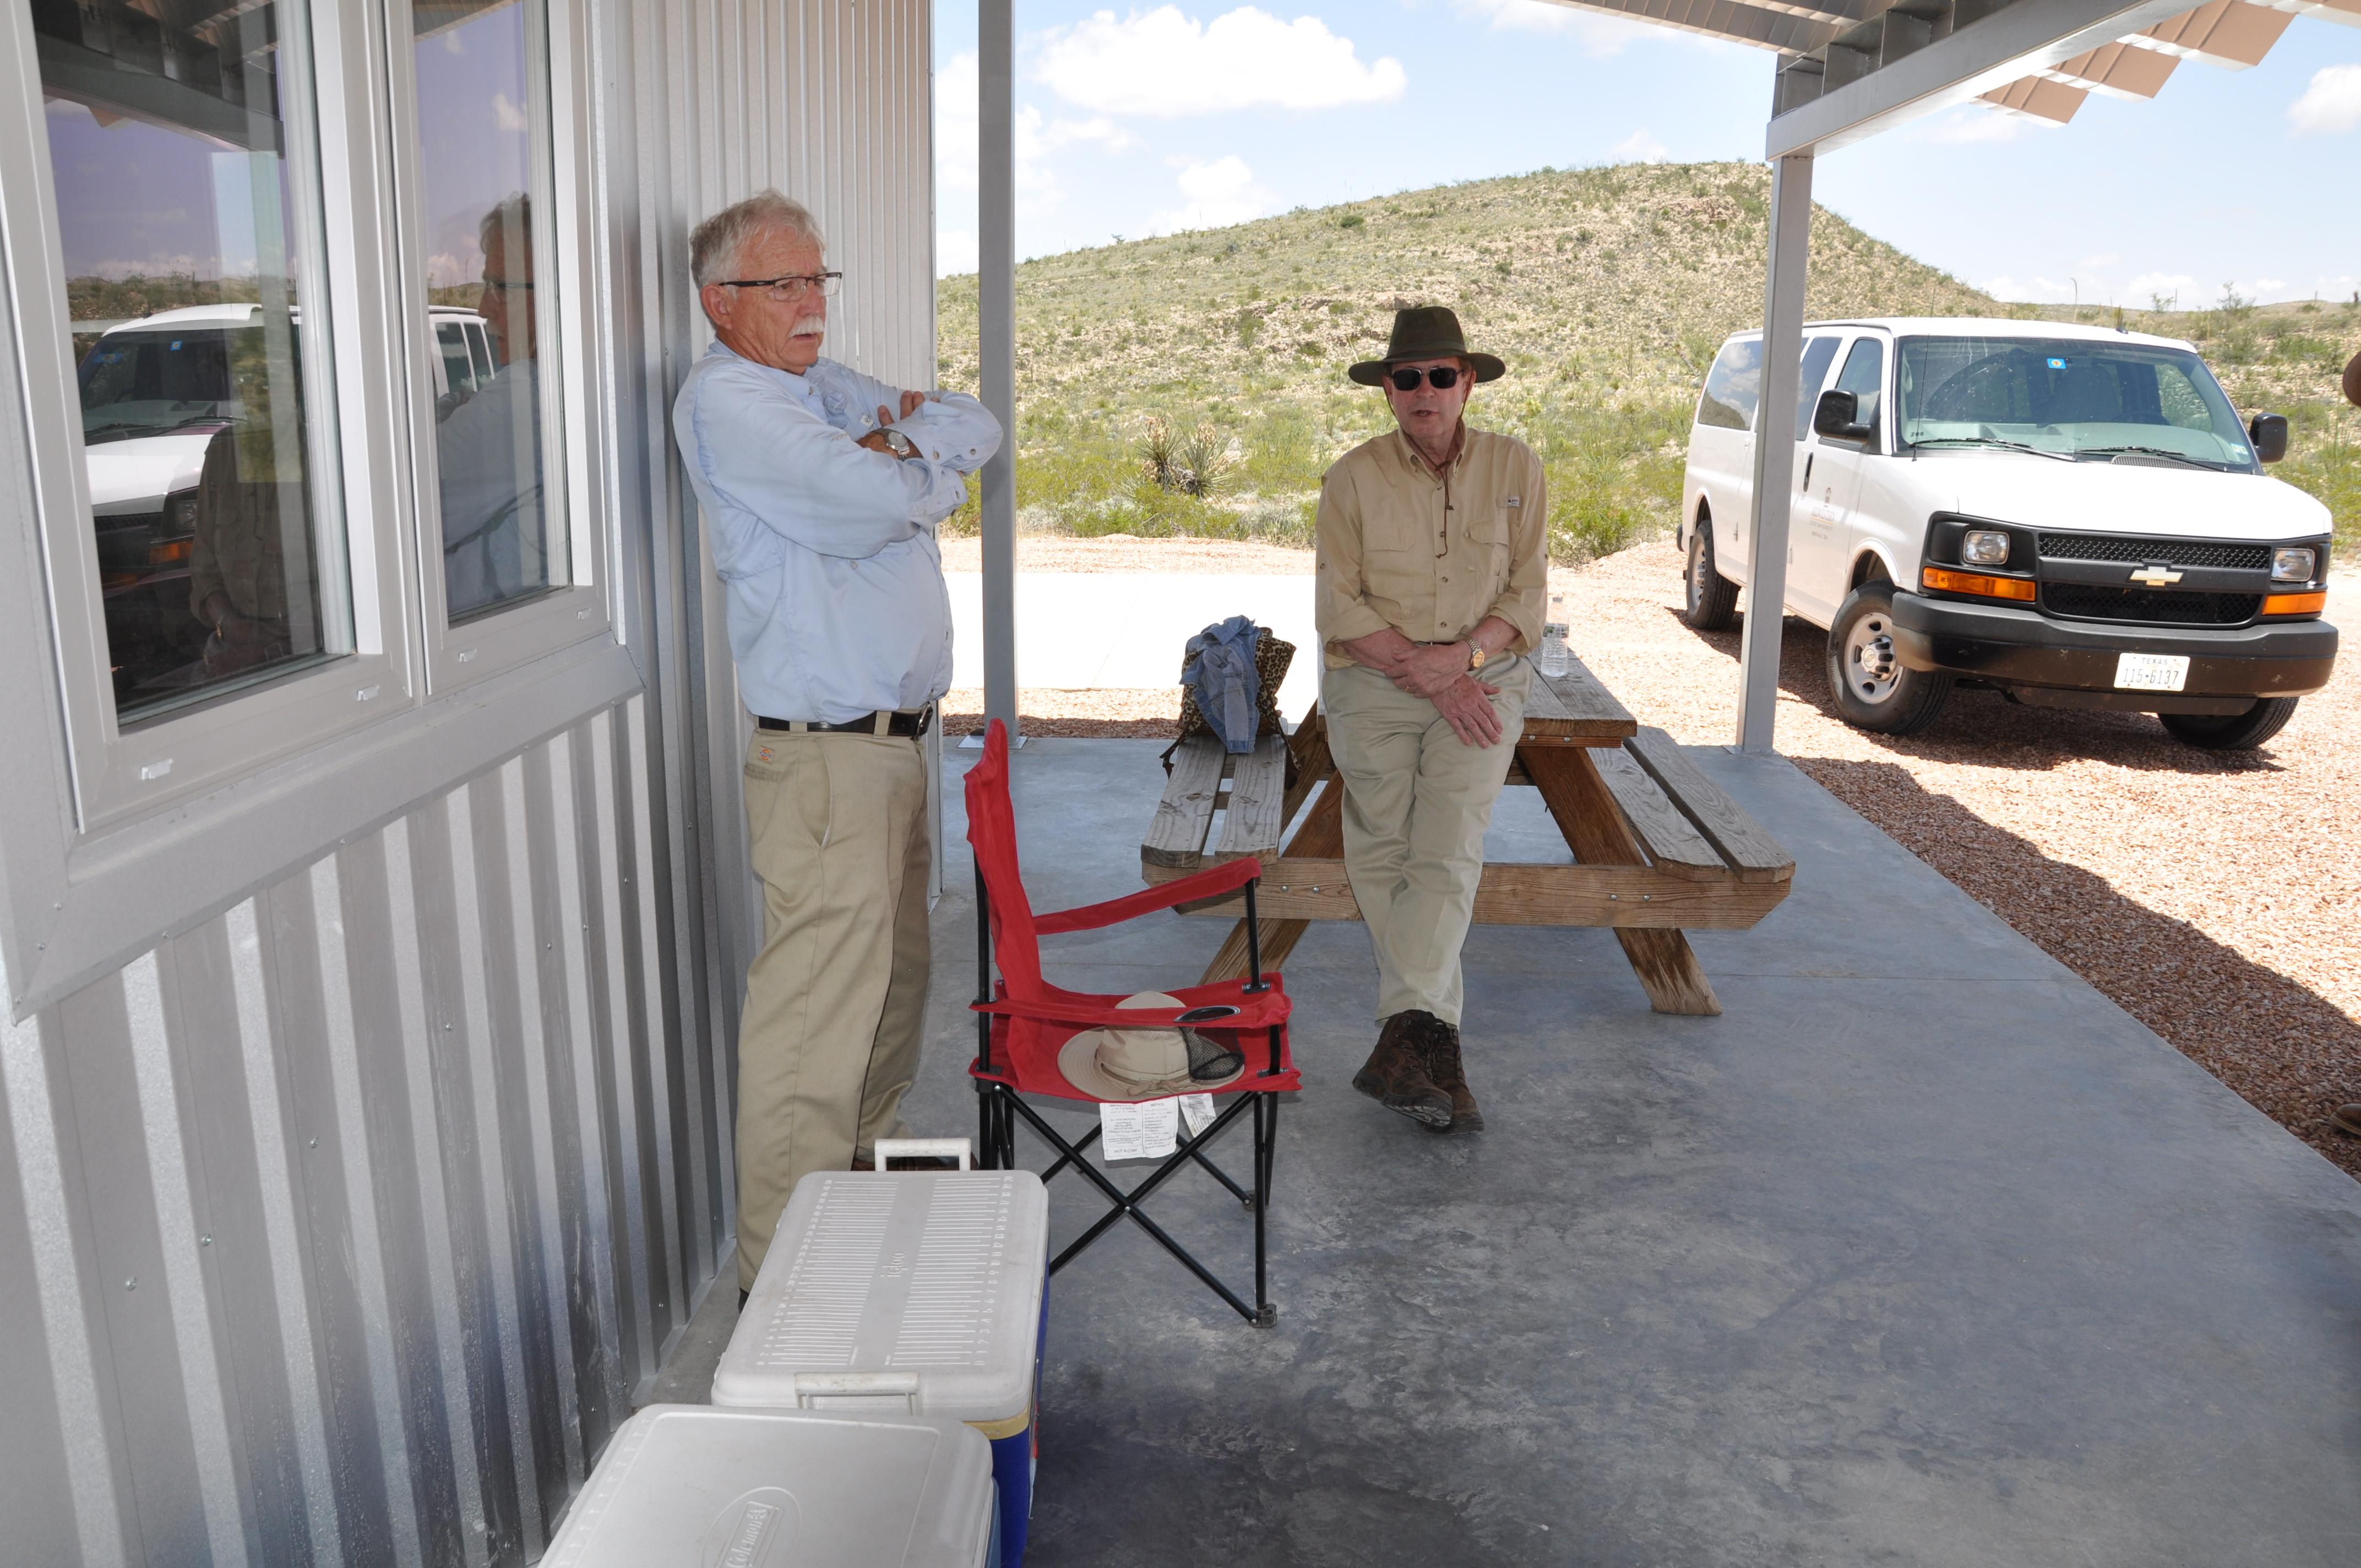 All roads lead to Dalquest: Professor's dream comes true in the Chihuahuan Desert